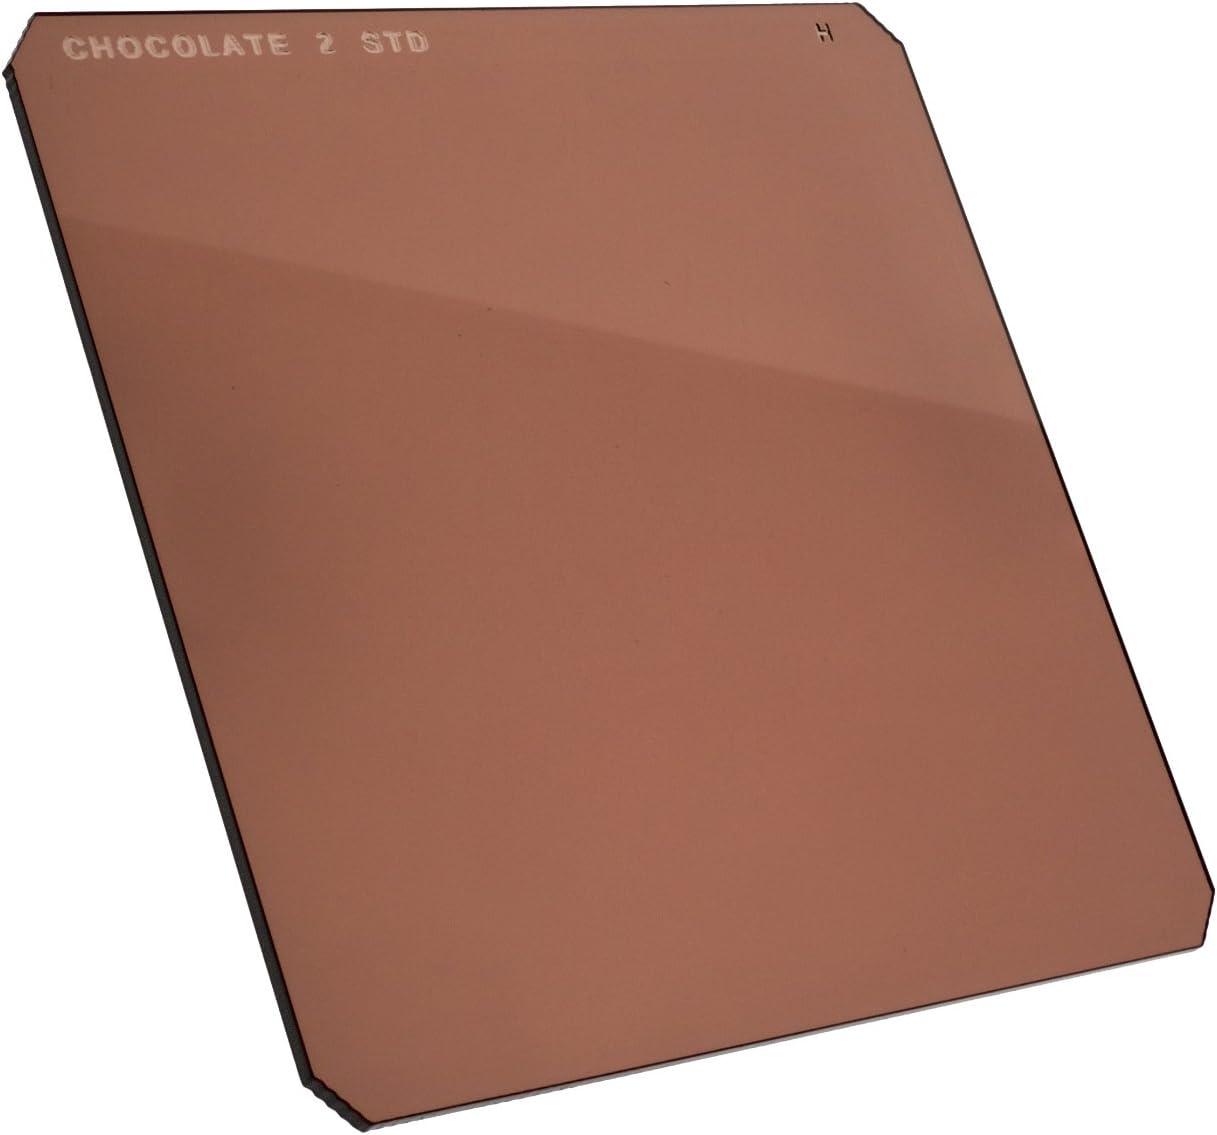 2.67x3.35 Resin Solid Color Chocolate 3 Formatt-Hitech 67x85mm